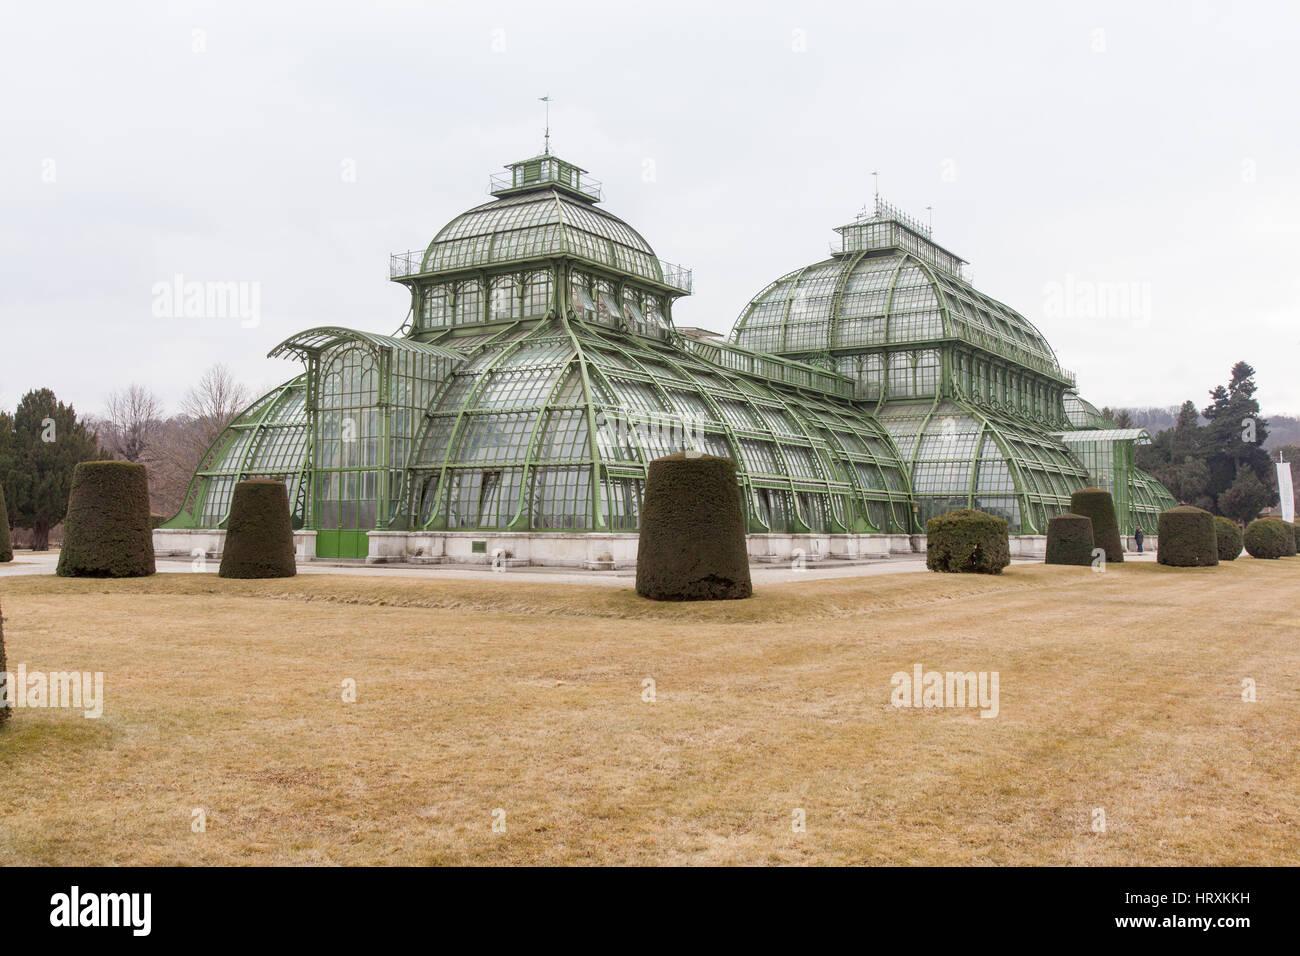 Palm House or Palmenhaus in the Schönbrunn palace gardens, Vienna, Austria. - Stock Image